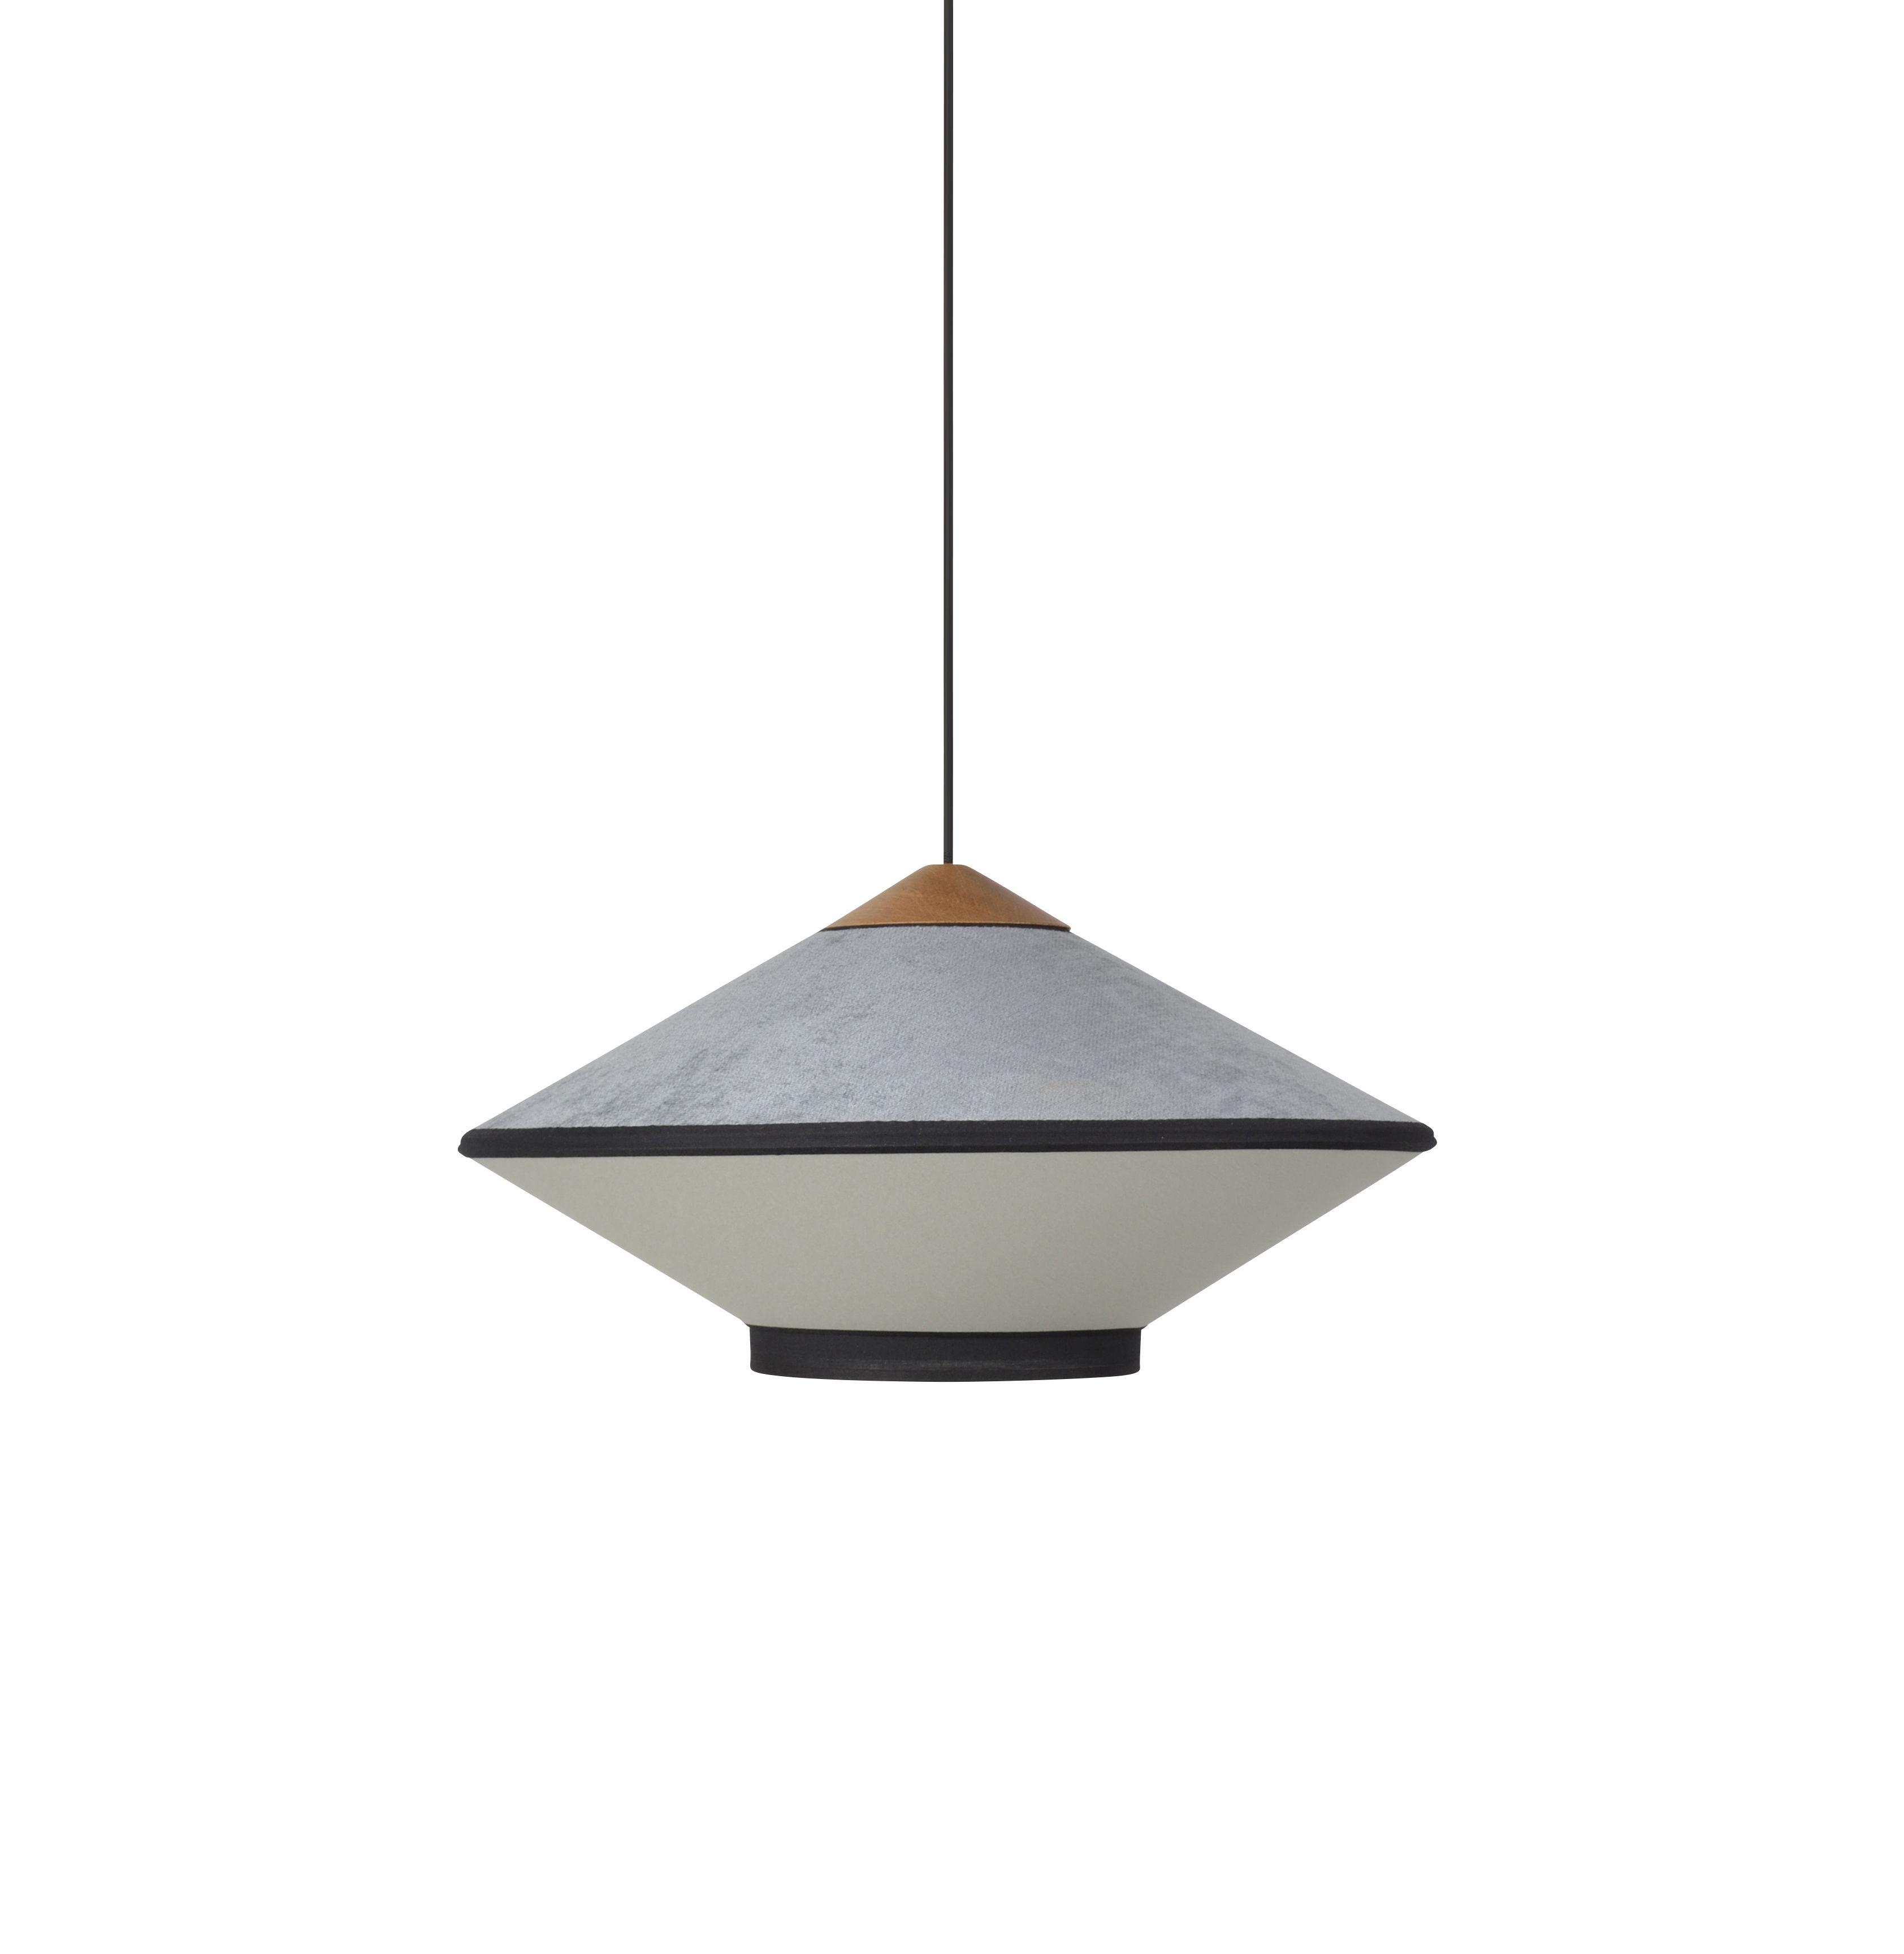 Luminaire - Suspensions - Suspension Cymbal Small / Ø 50 - Velours - Forestier - Bleu clair - Chêne, Tissu, Velours